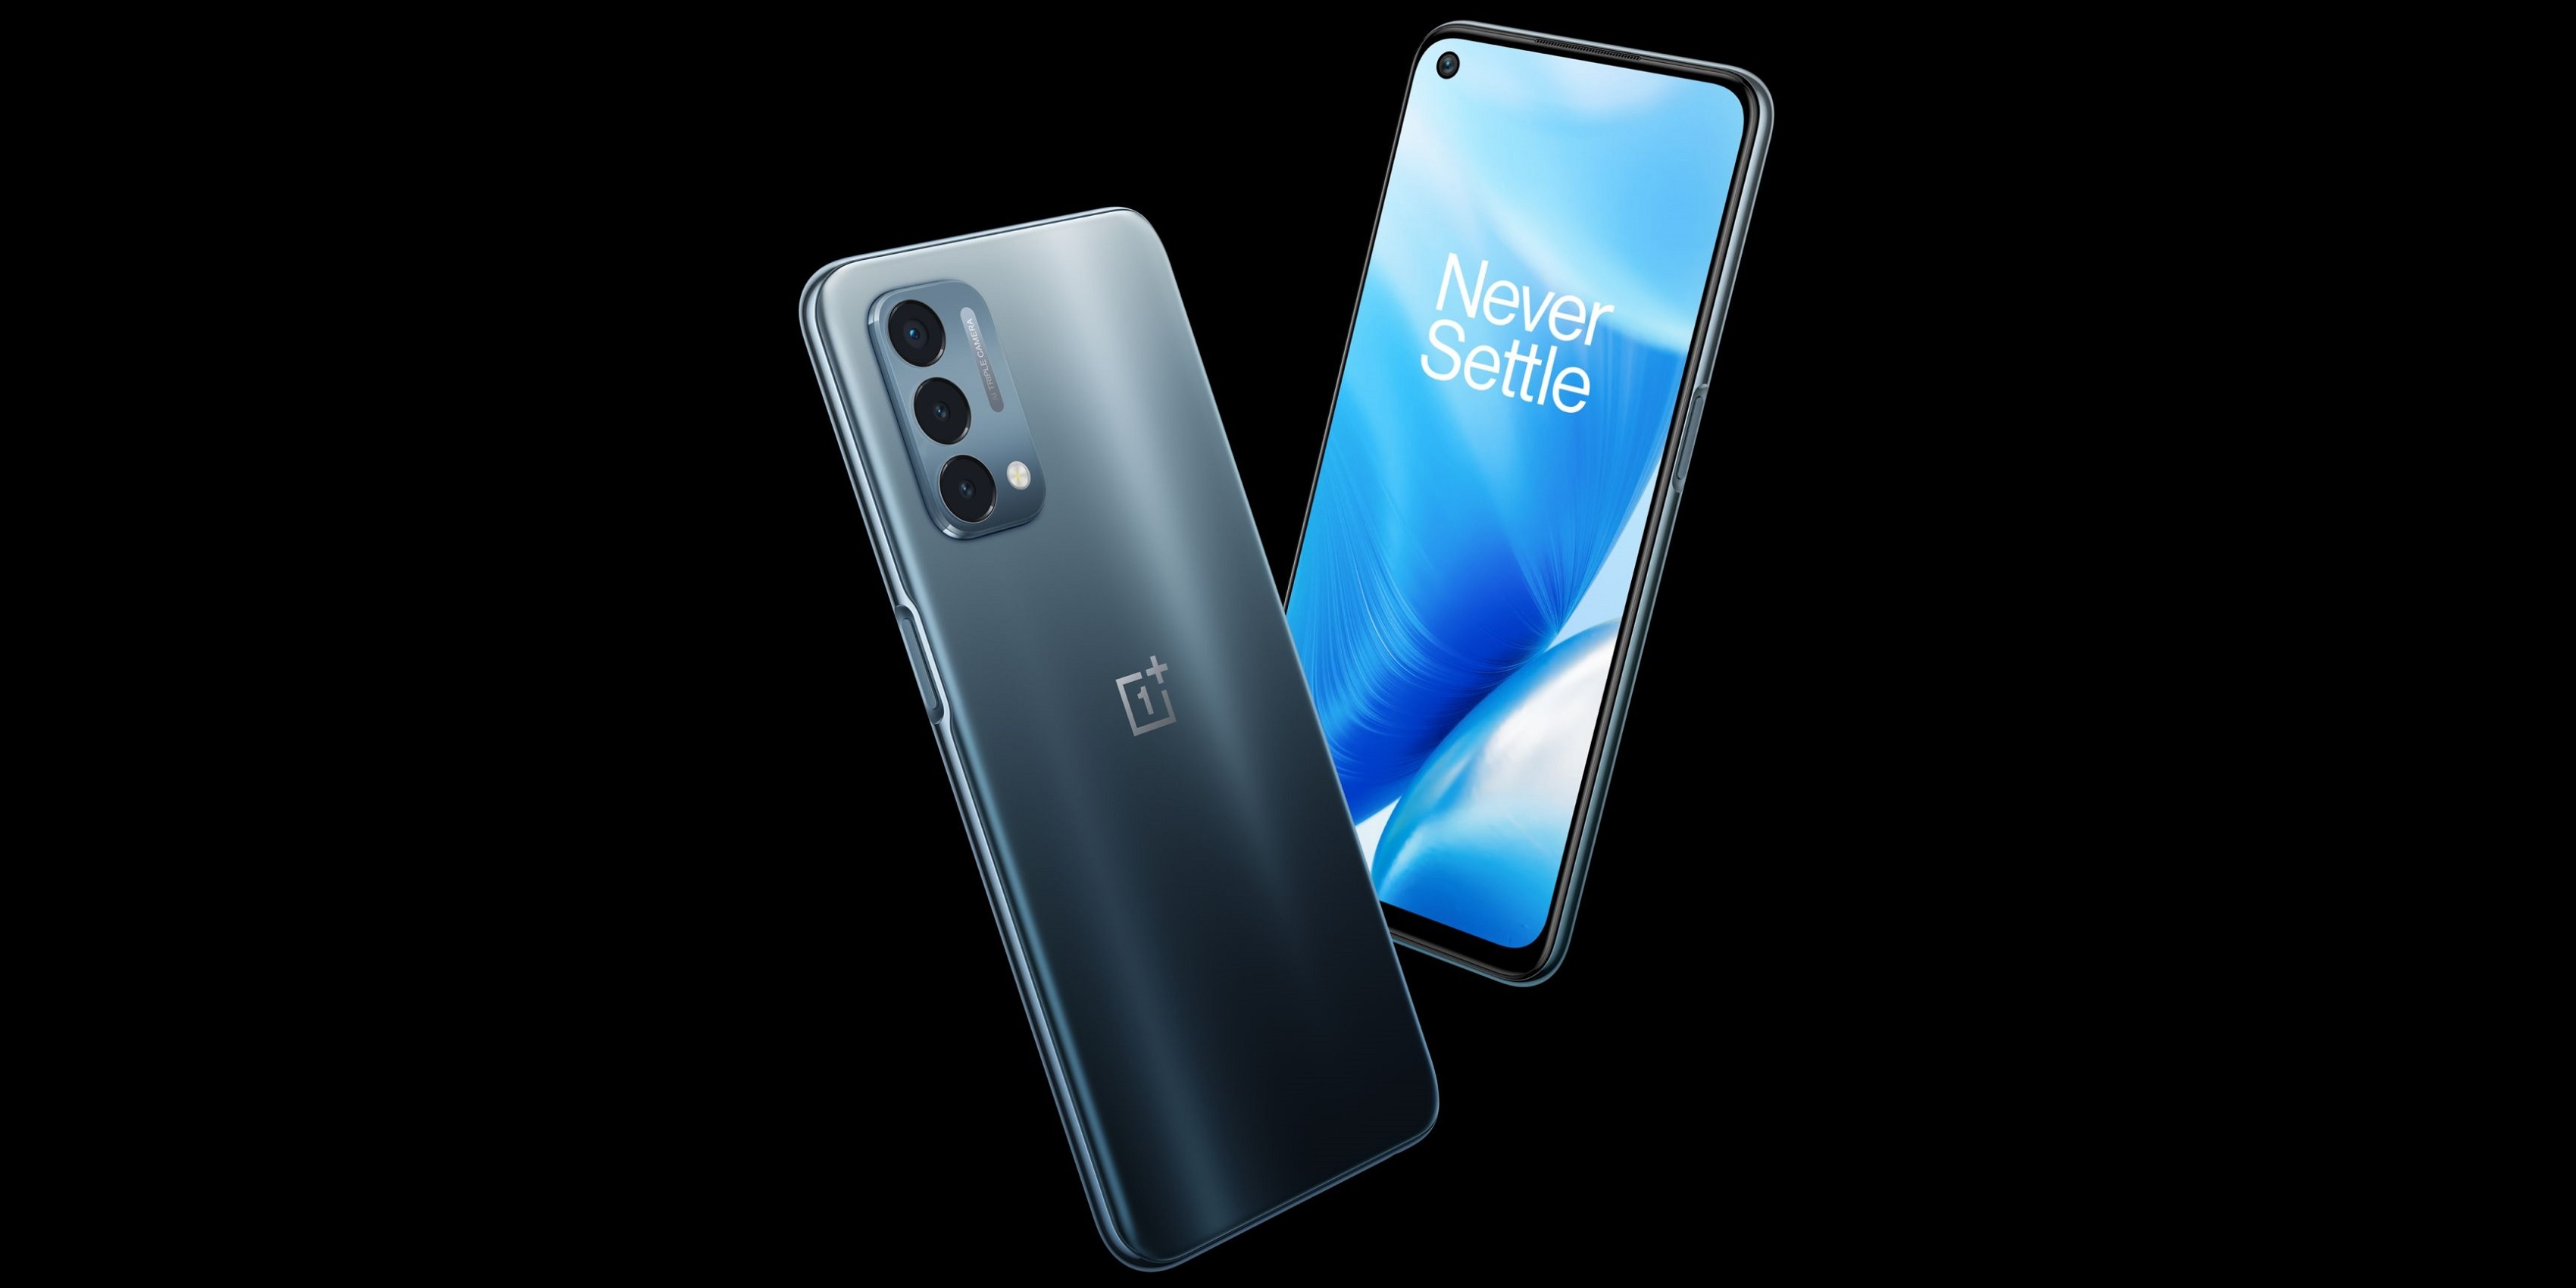 smartfon OnePlus N200 5G smartphone